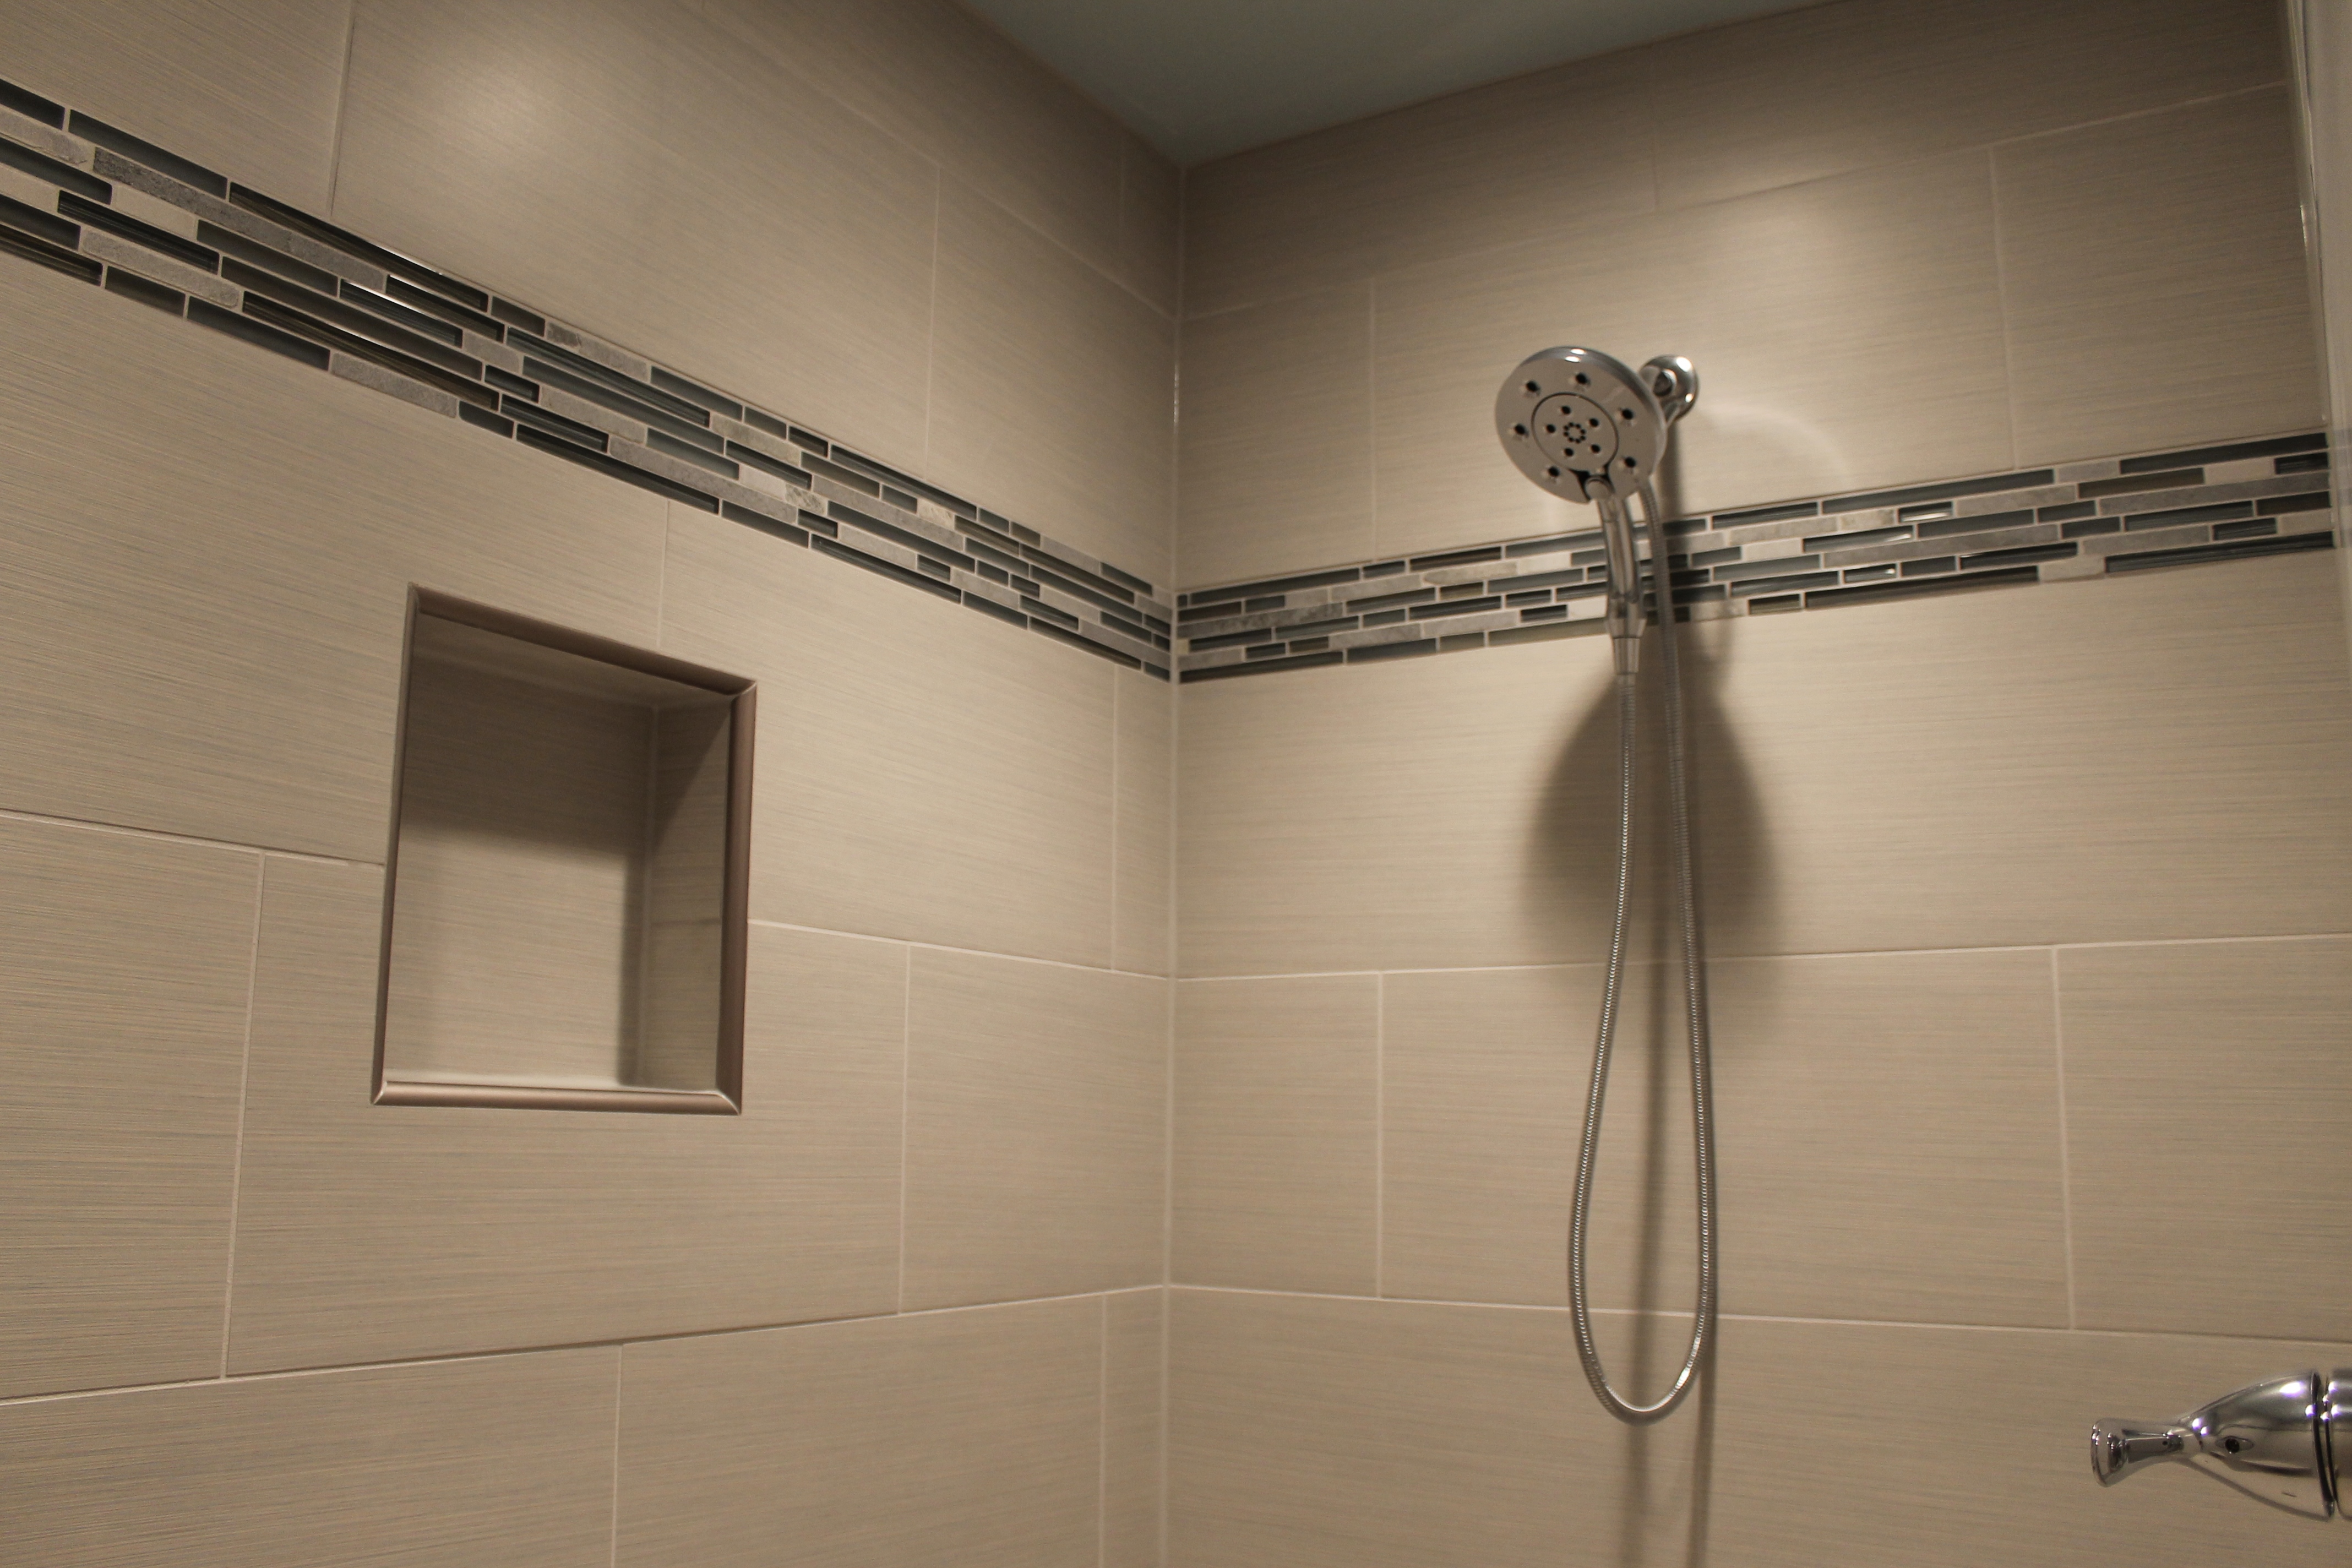 Shower Tile Edging Trim Nd85 Roccommunity